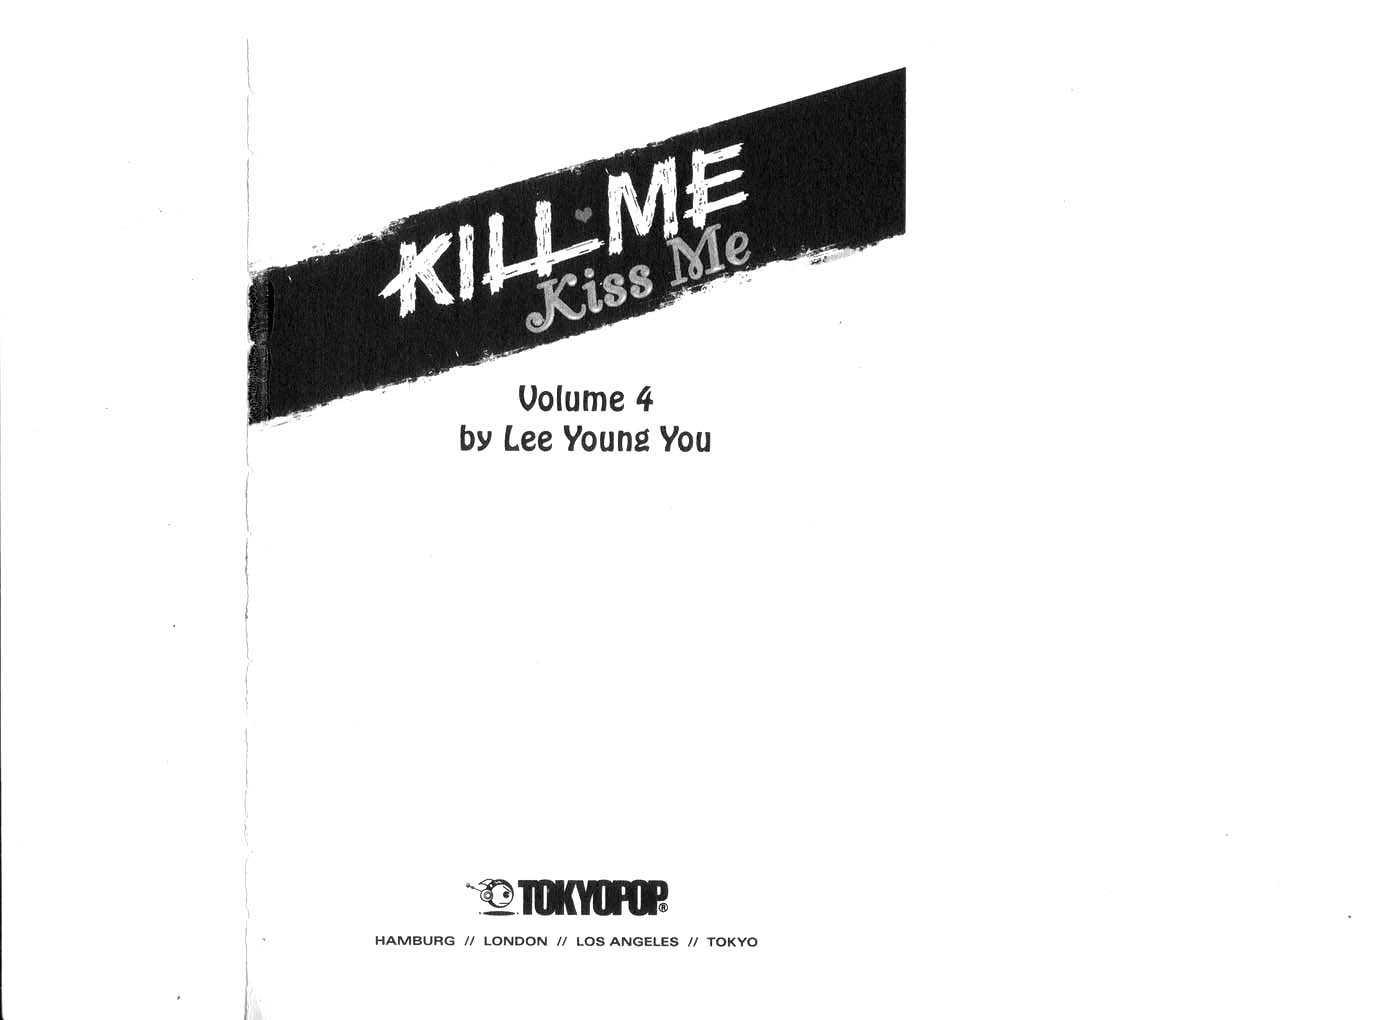 Kill Me Kiss Me 0 Page 2